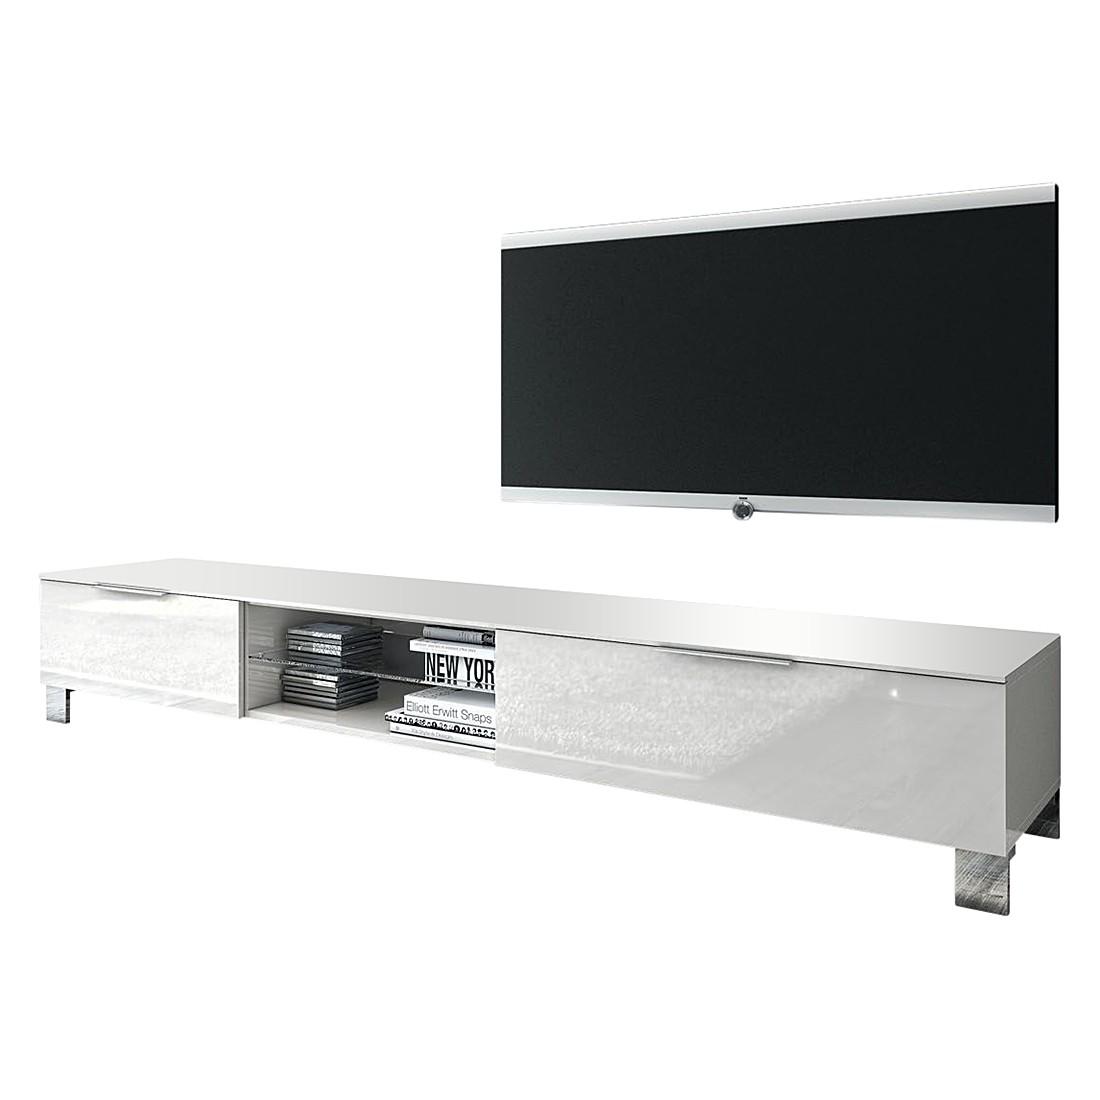 Tv-lowboard Margherita III hoogglans wit 180cm, Lc Mobili